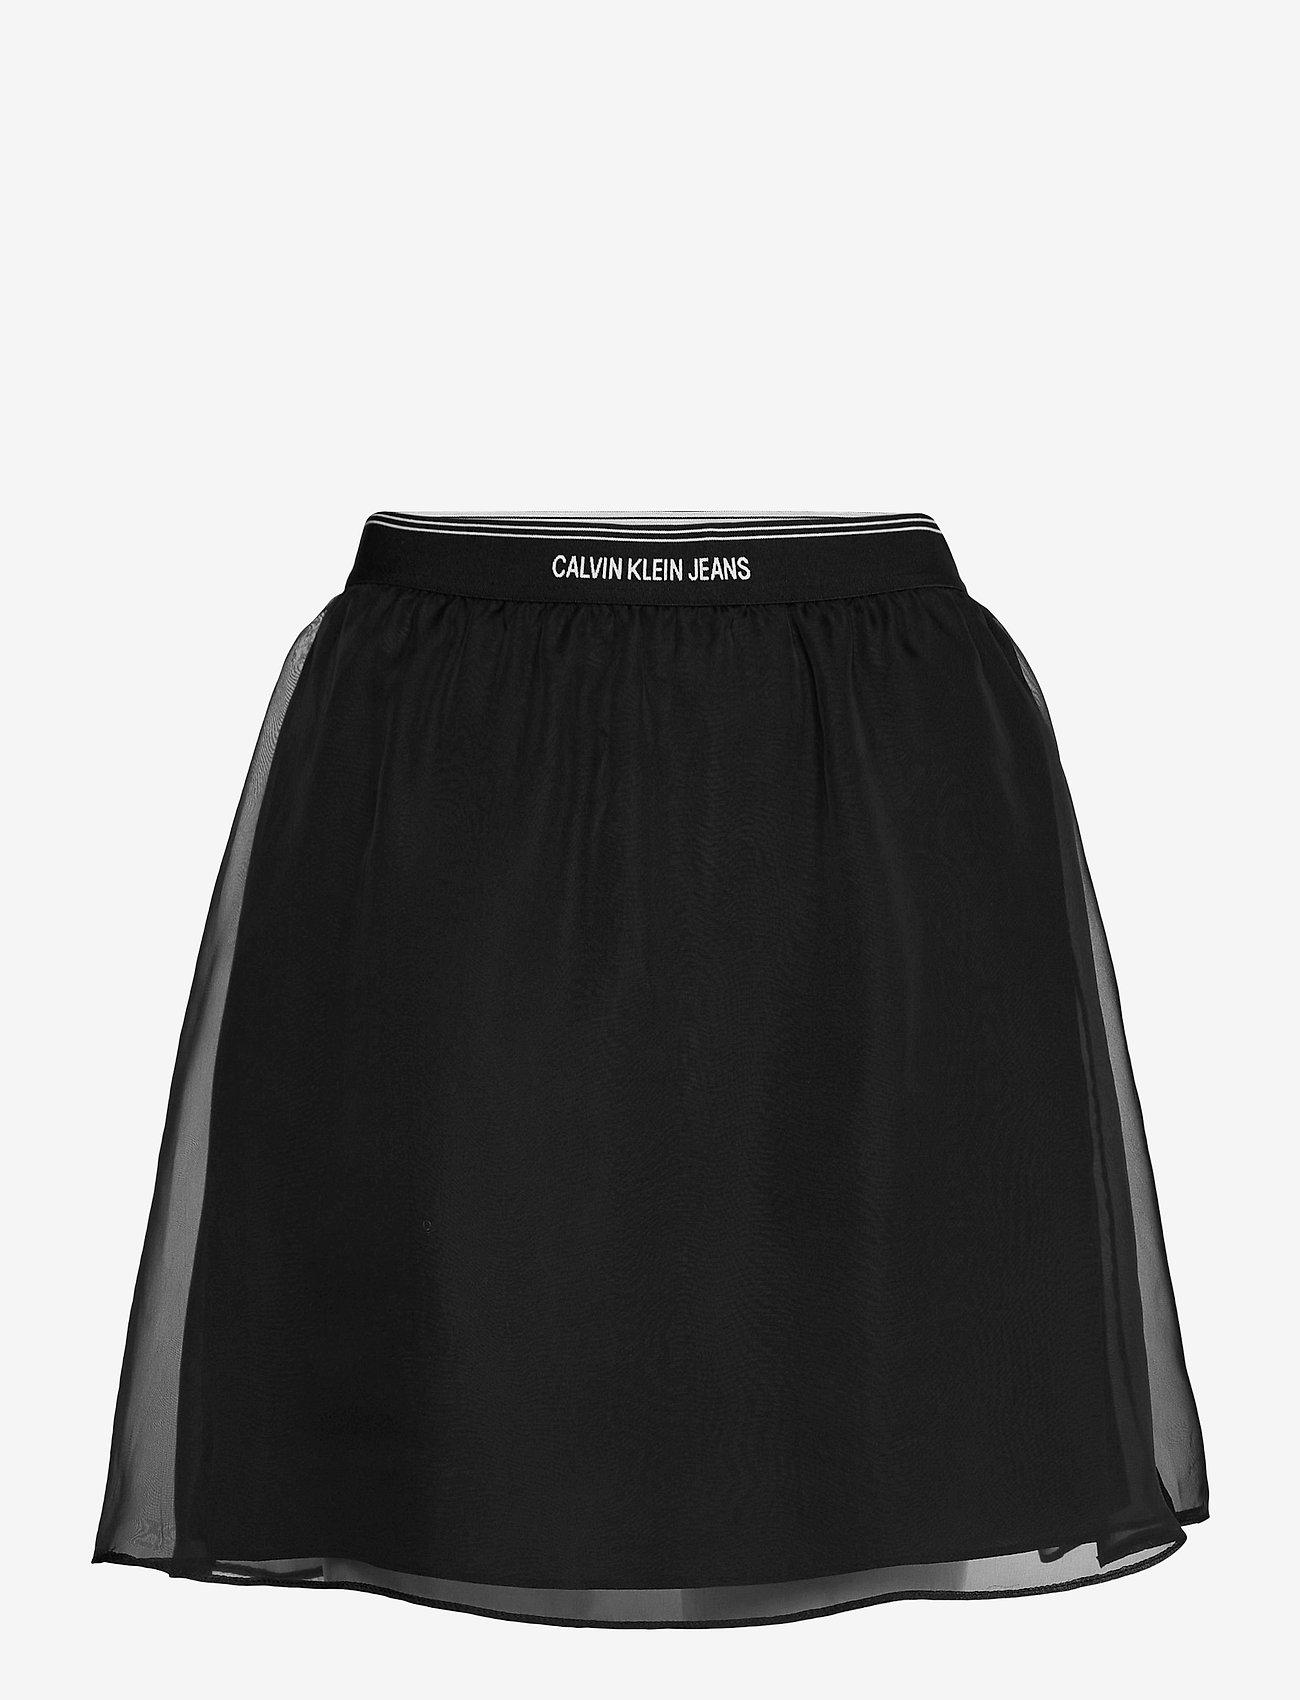 Calvin Klein Jeans - LOGO WAISTBAND CHIFFON SKIRT - korta kjolar - ck black - 0